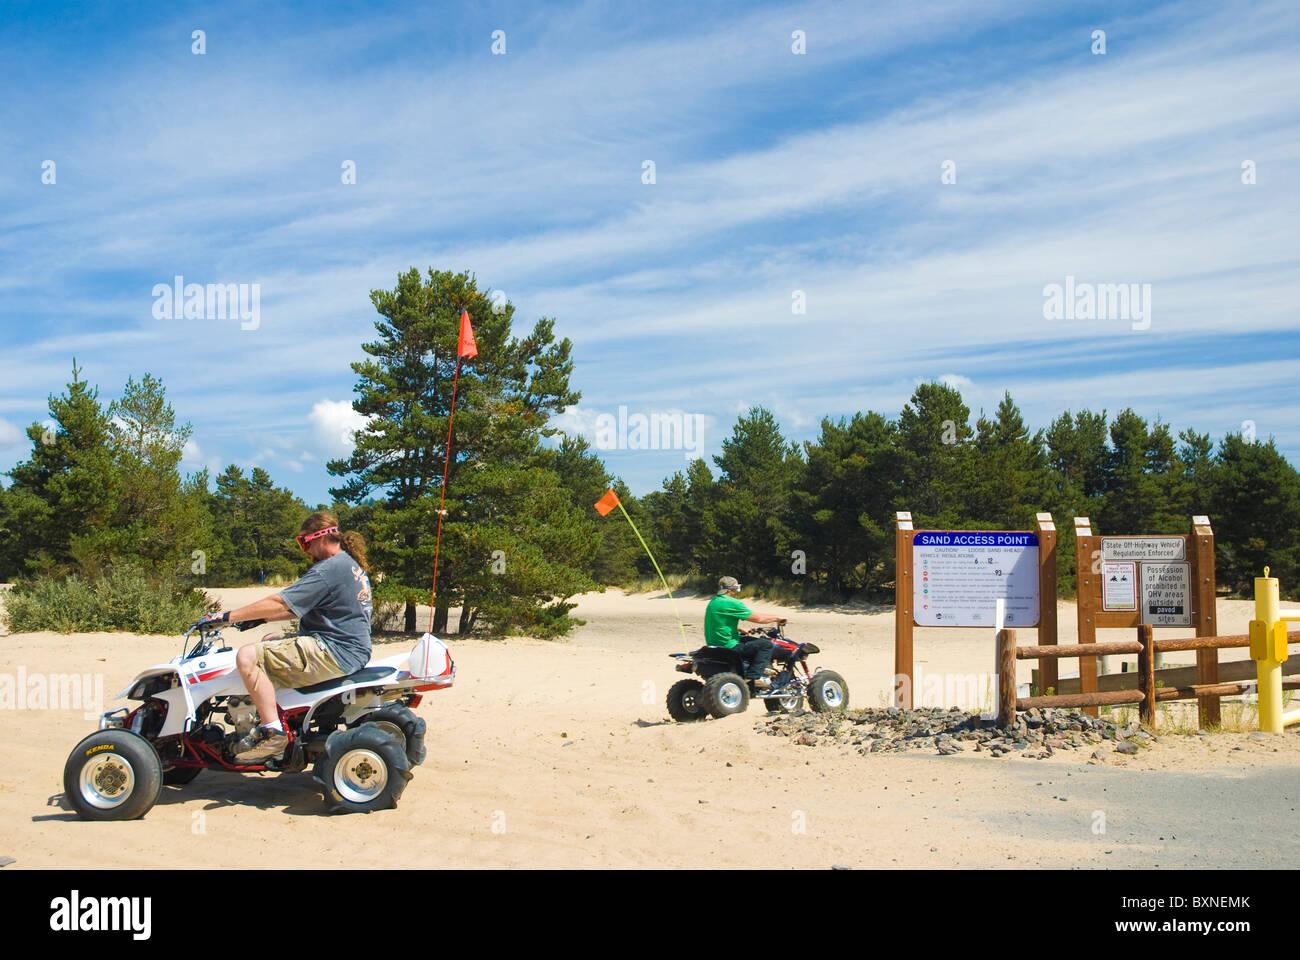 Four wheeling at the Oregon Dunes National Recreation Area, Coos Bay, Oregon Stock Photo